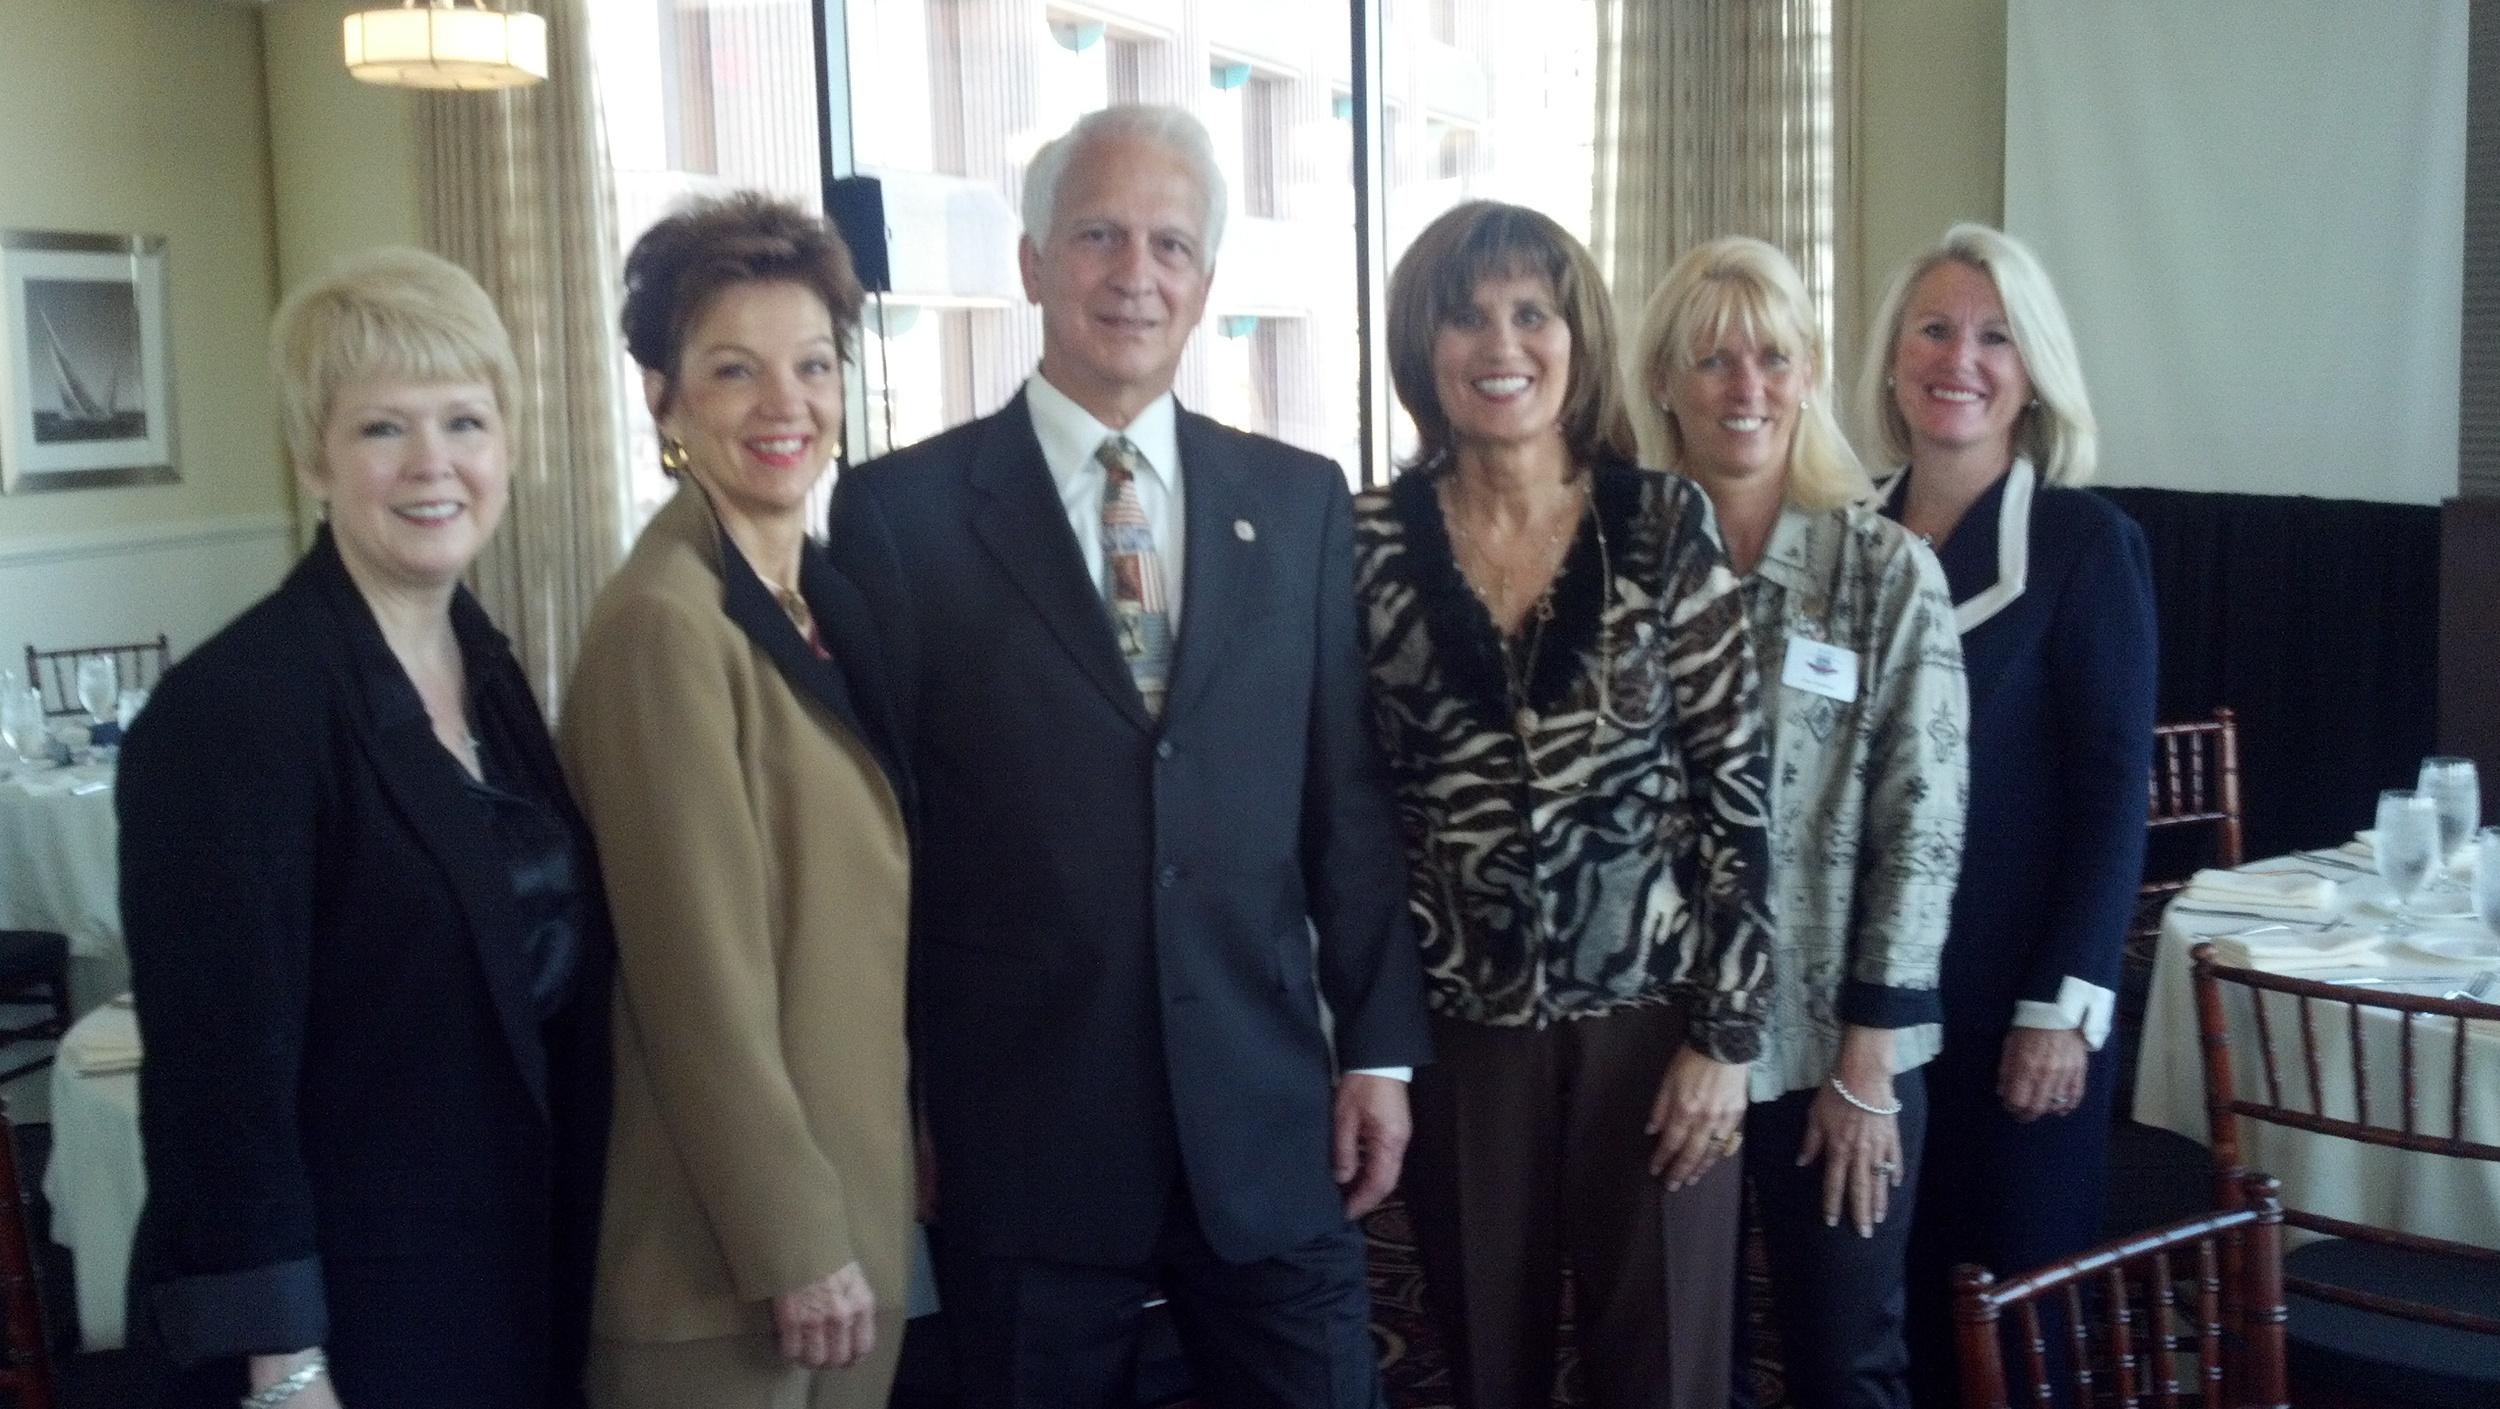 Debbie Hart, Nancy Schulze, Art Ally, Dran Reese, Sue Trombino, Susan Aleshire.jpg